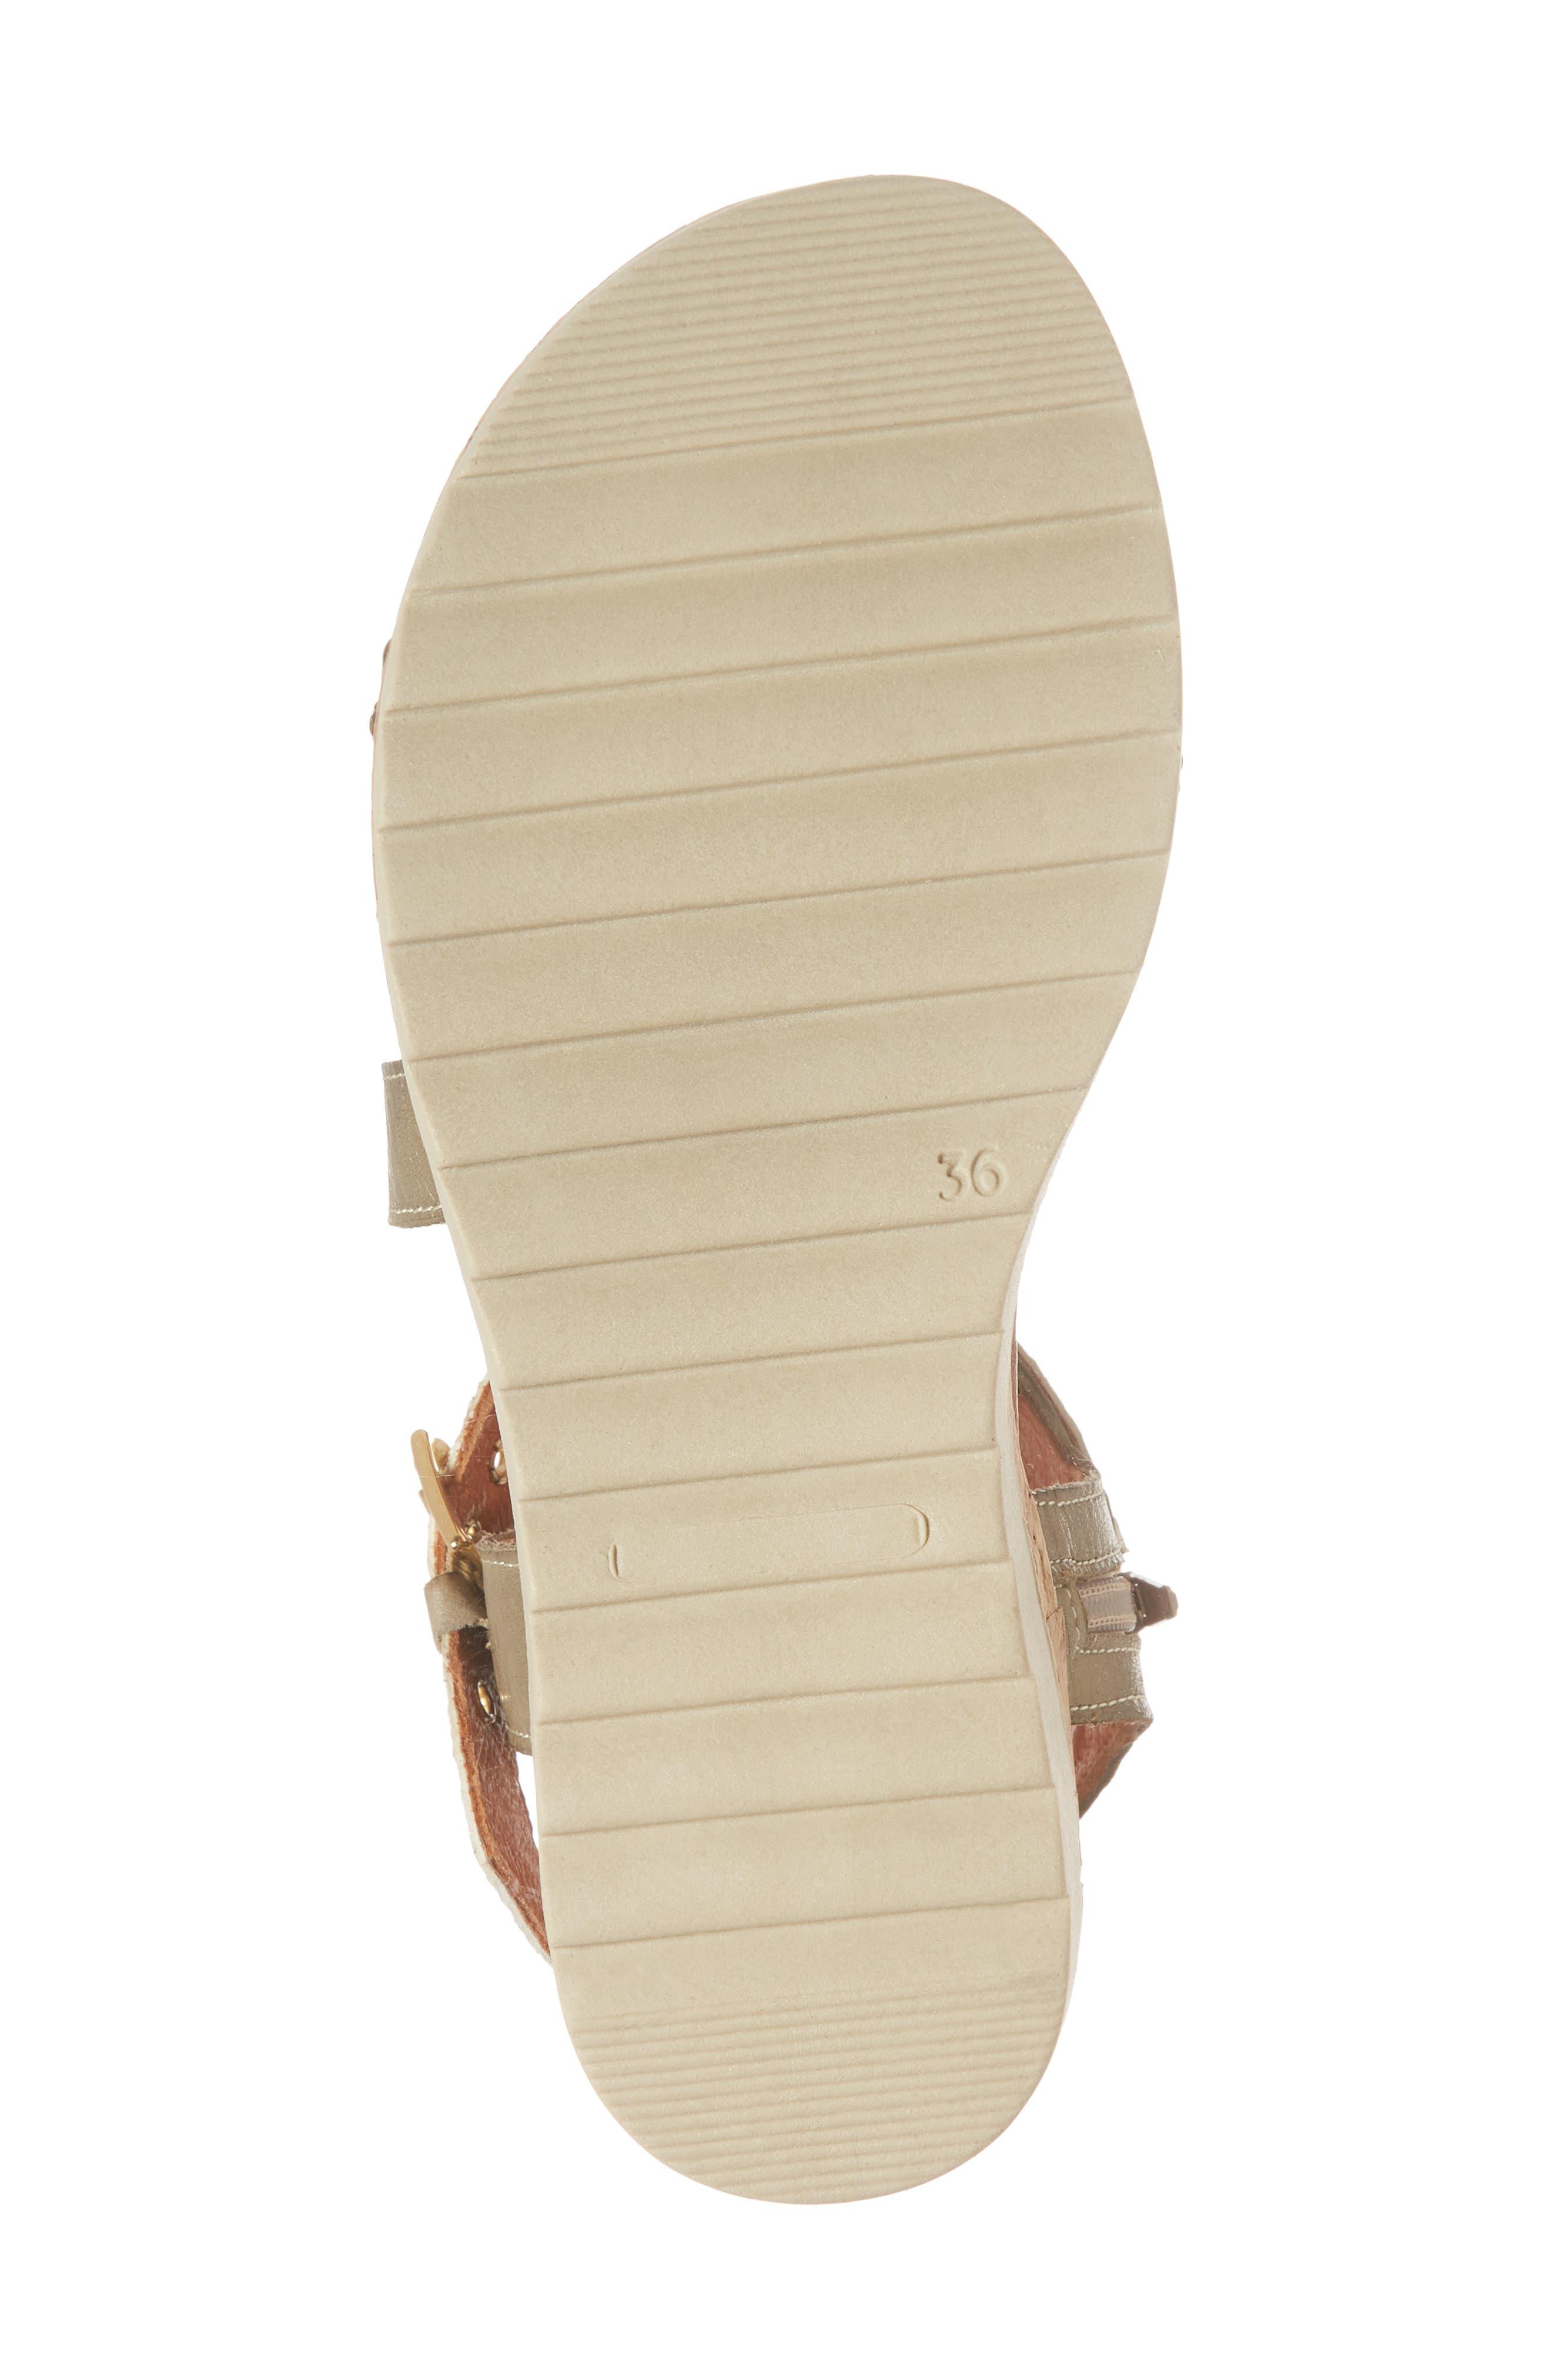 Gaga Sandal,                             Alternate thumbnail 6, color,                             Taupe Leather